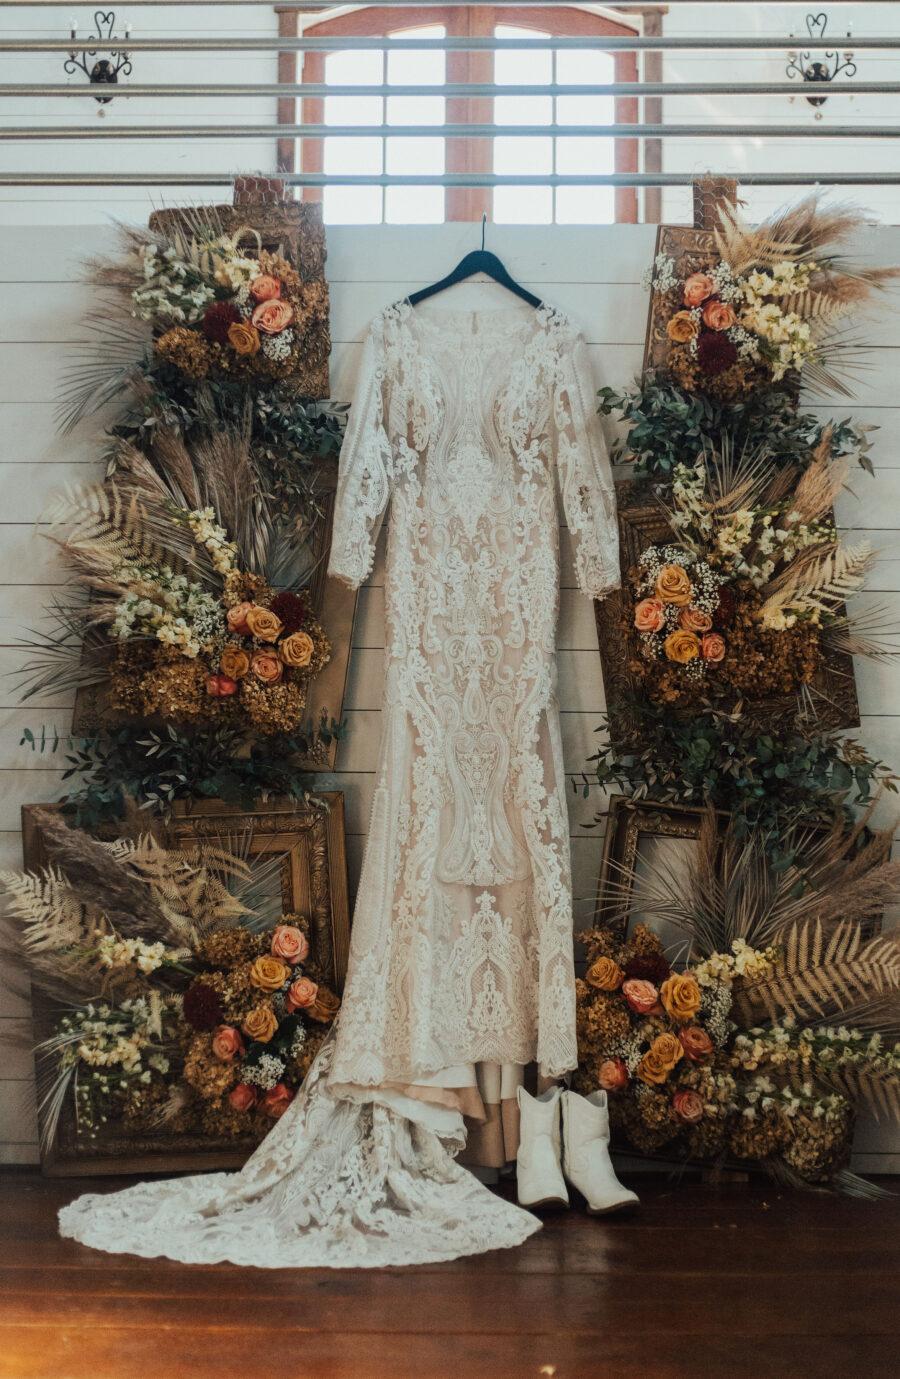 Lace wedding dress: Bright Bohemian Photo Shoot from Ina J Designs